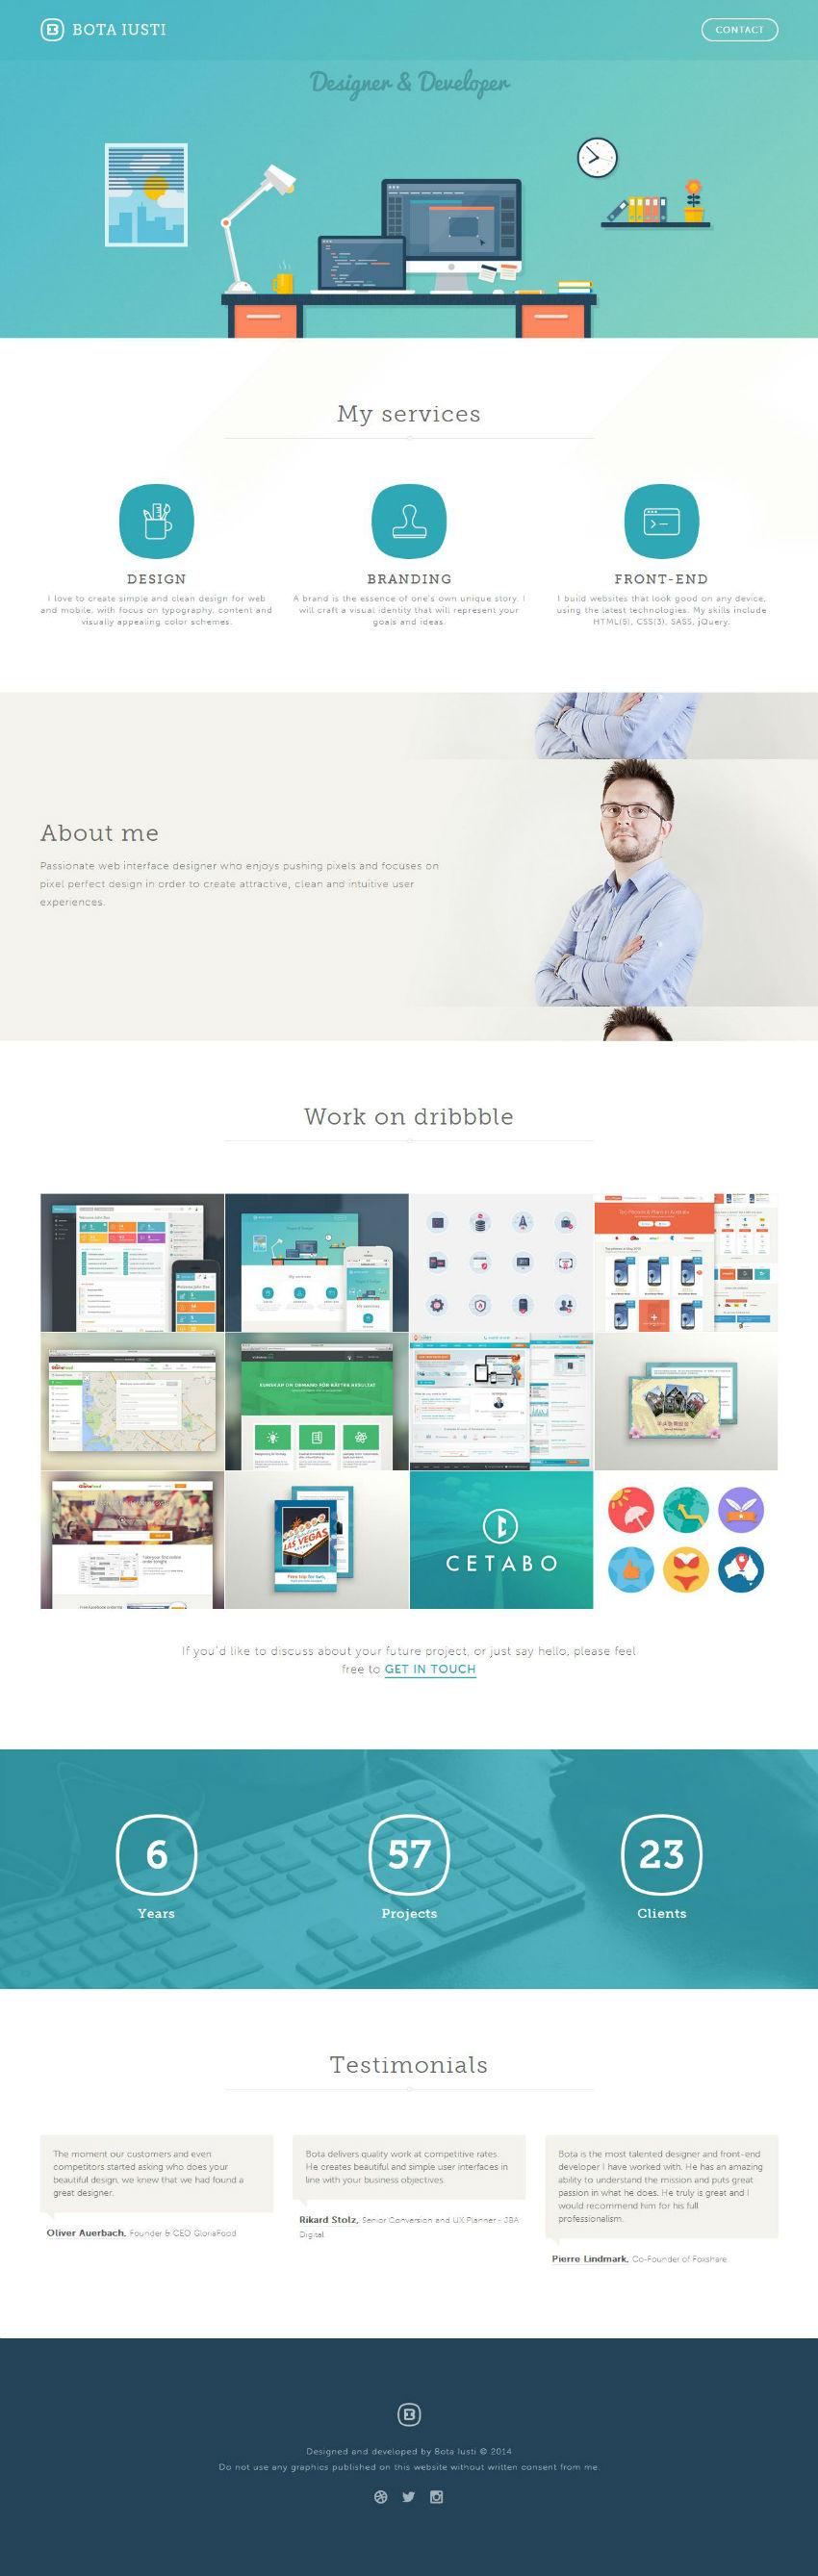 Bota Iusti - Designer and Front-end Developer